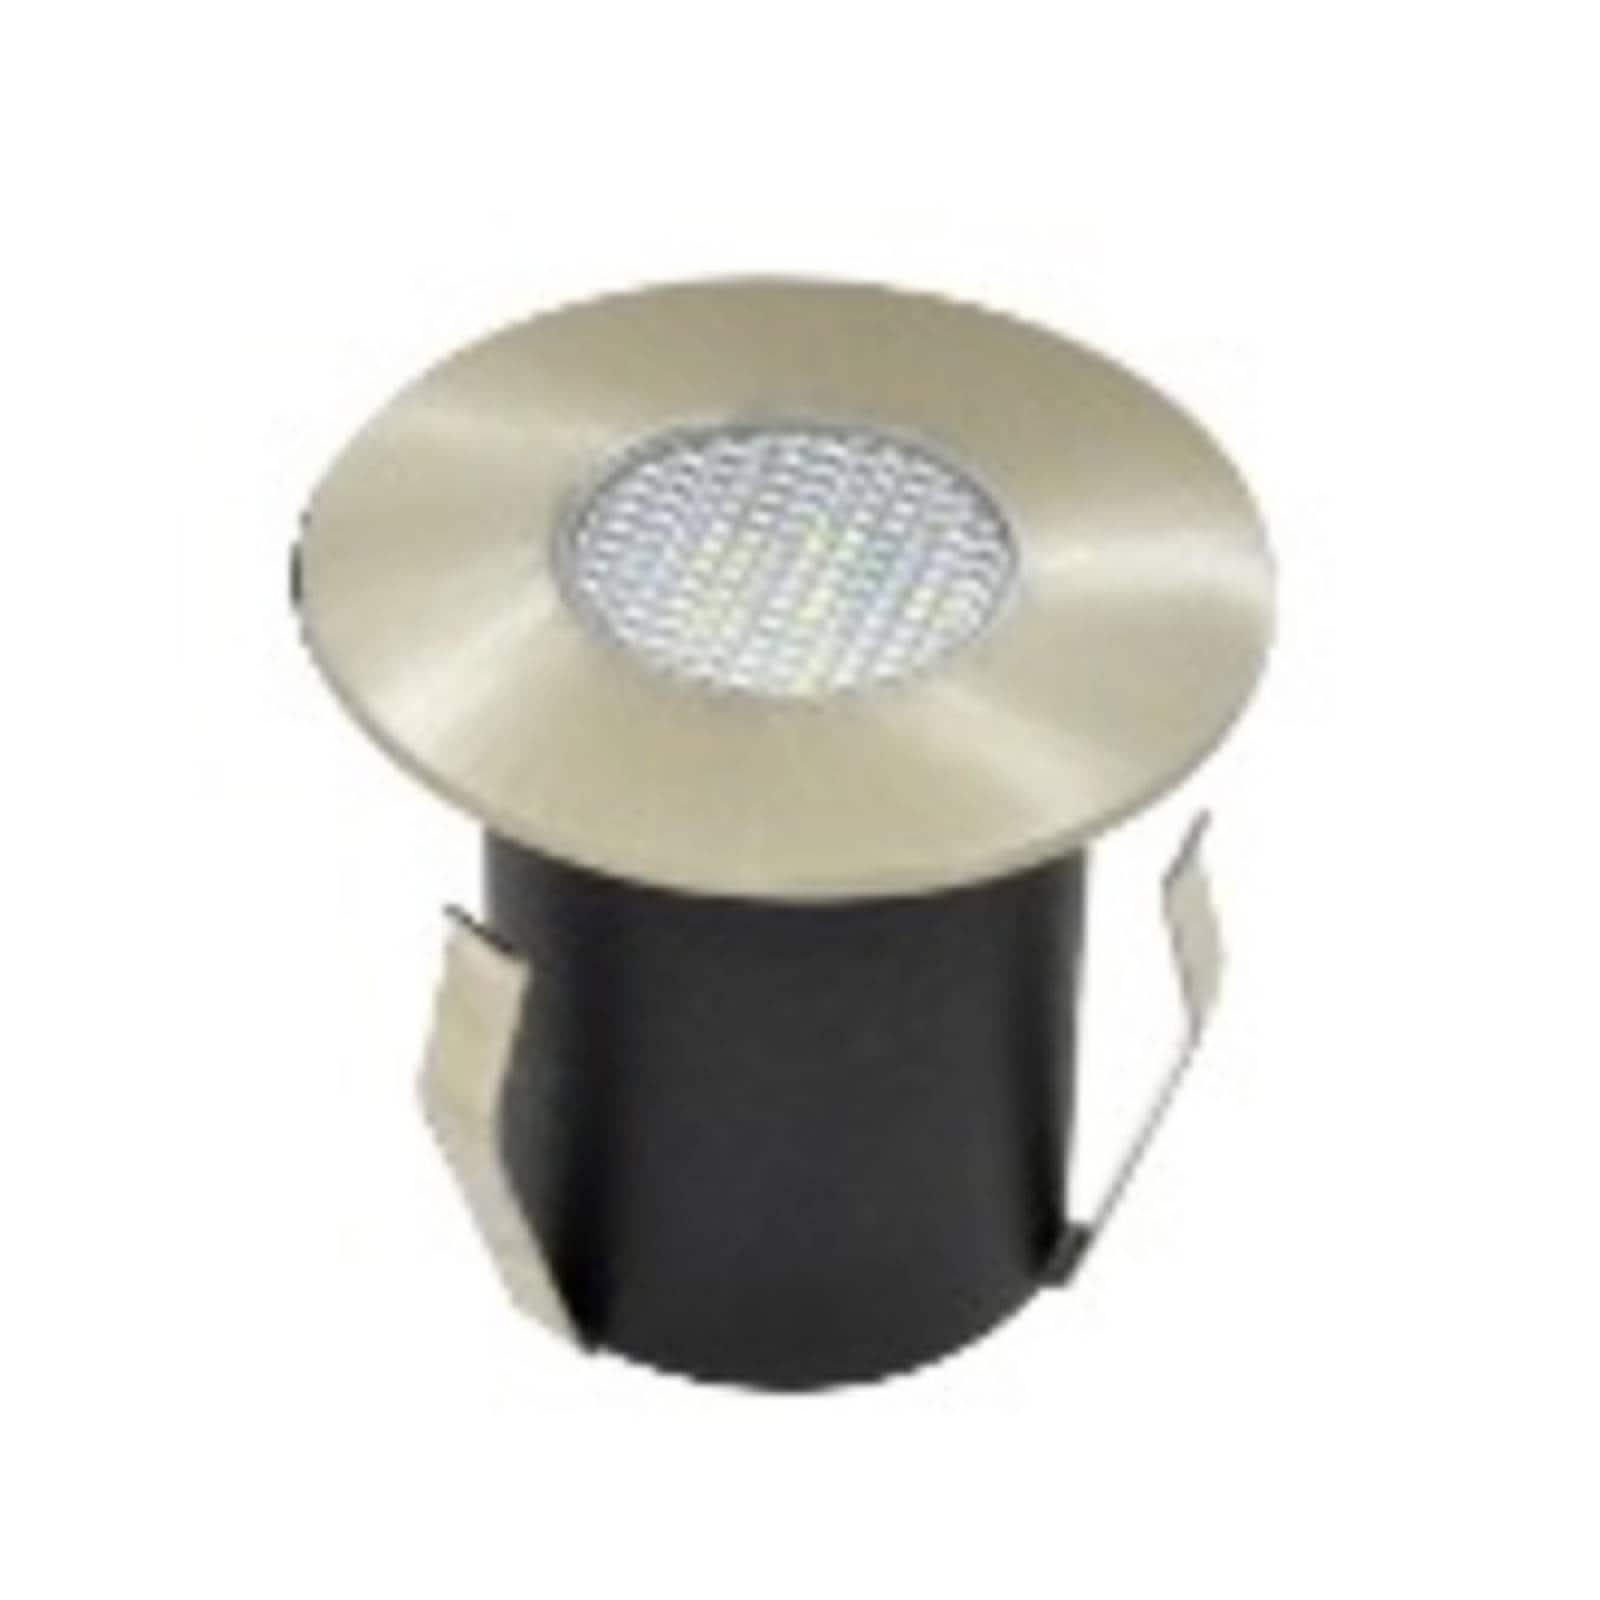 Lámpara Luminario Led Empotrado Piso Ad-5711 1W Azul Adir